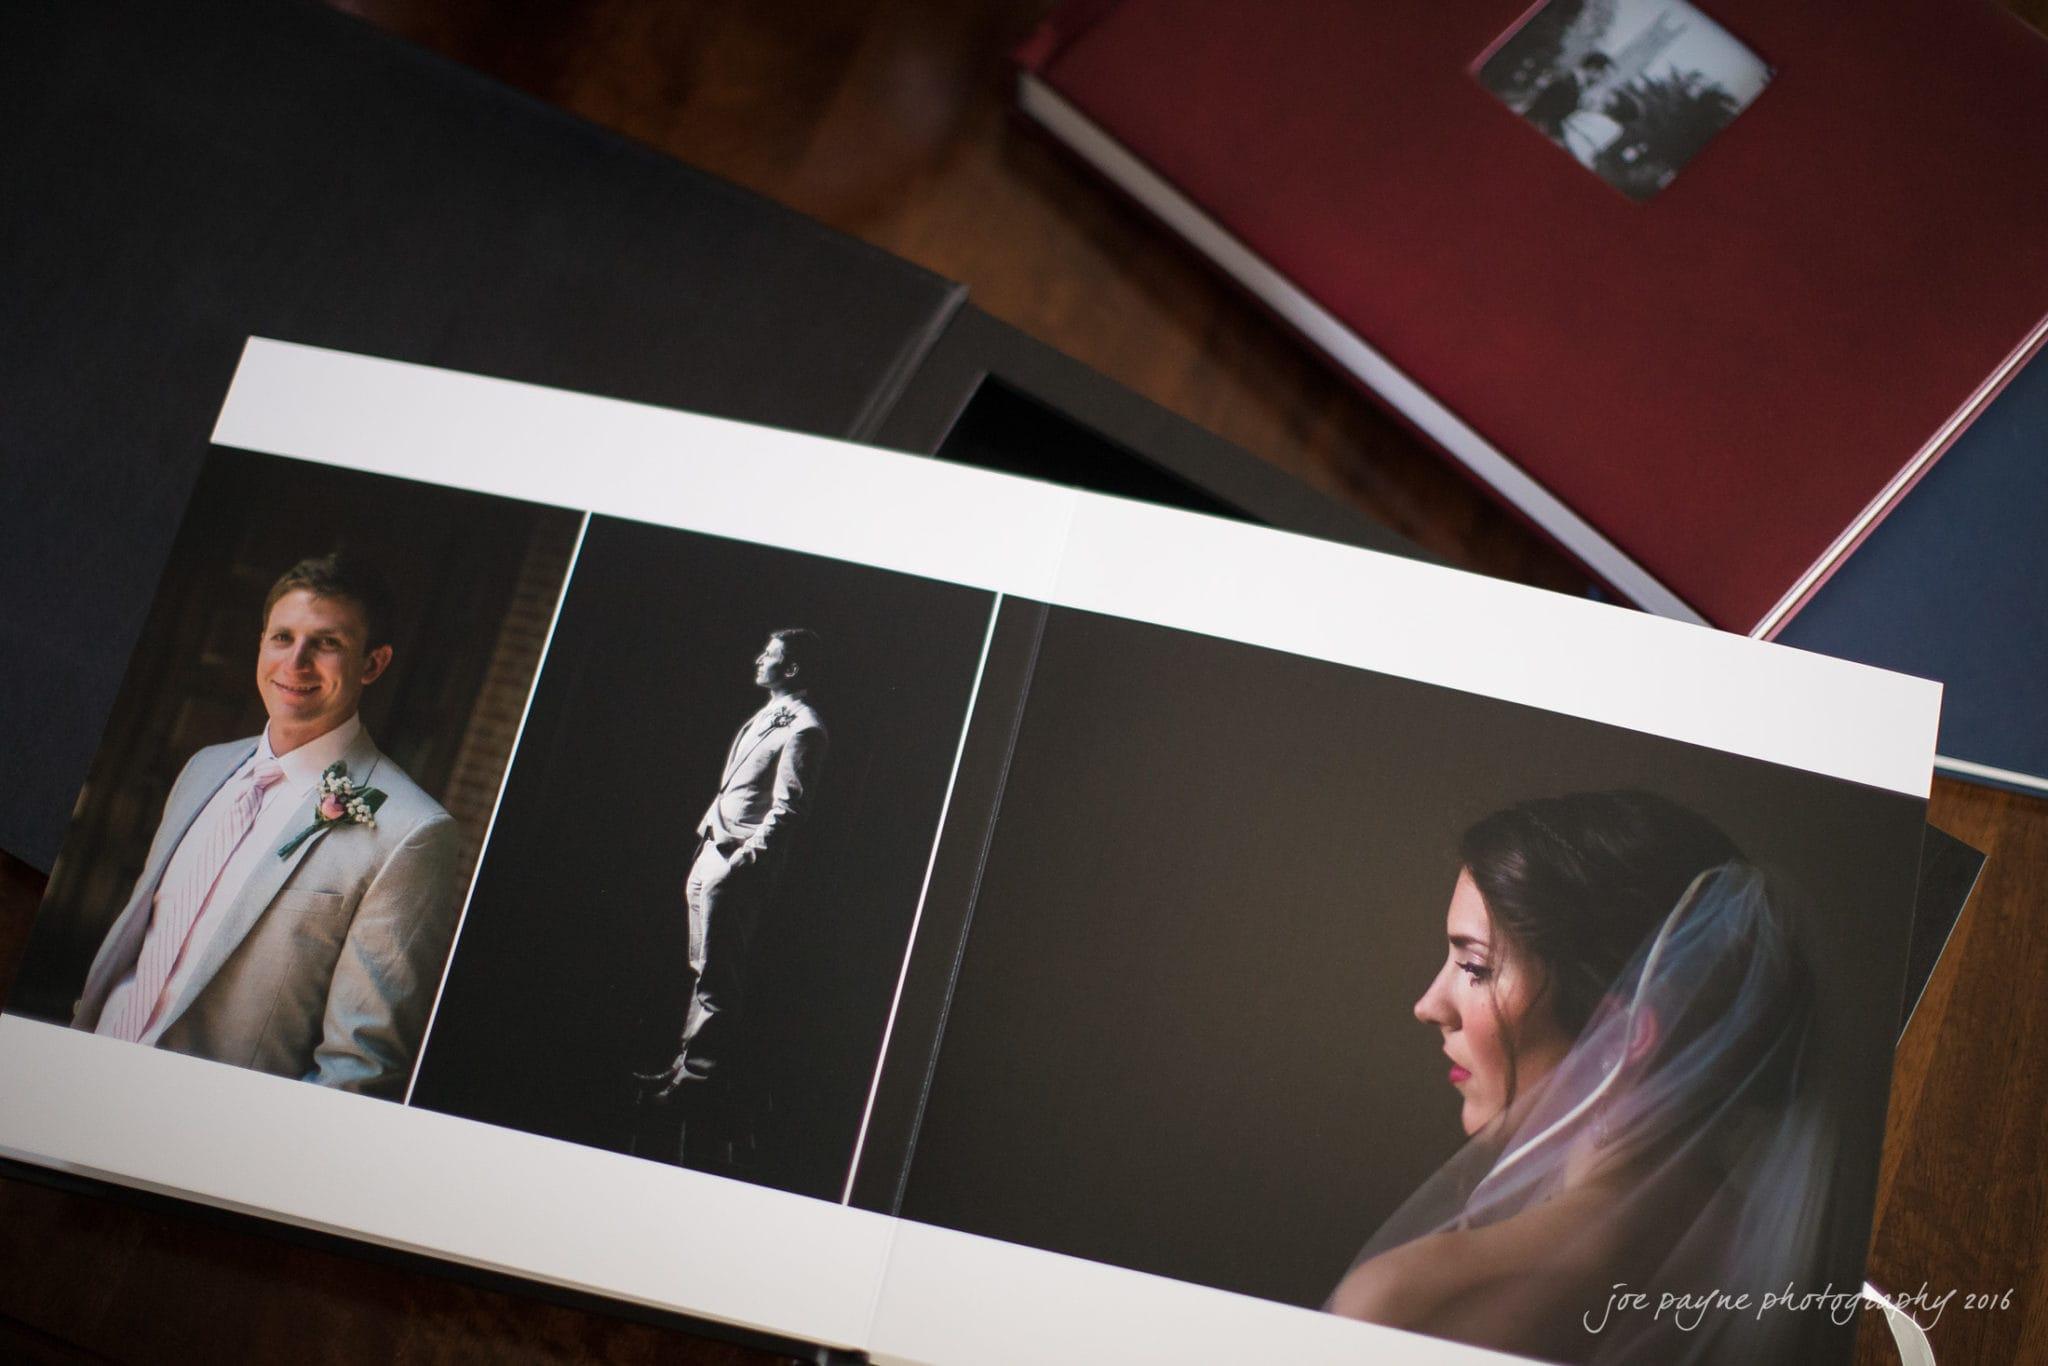 raleigh-wedding-photographer-joe-payne-photography-albums-5